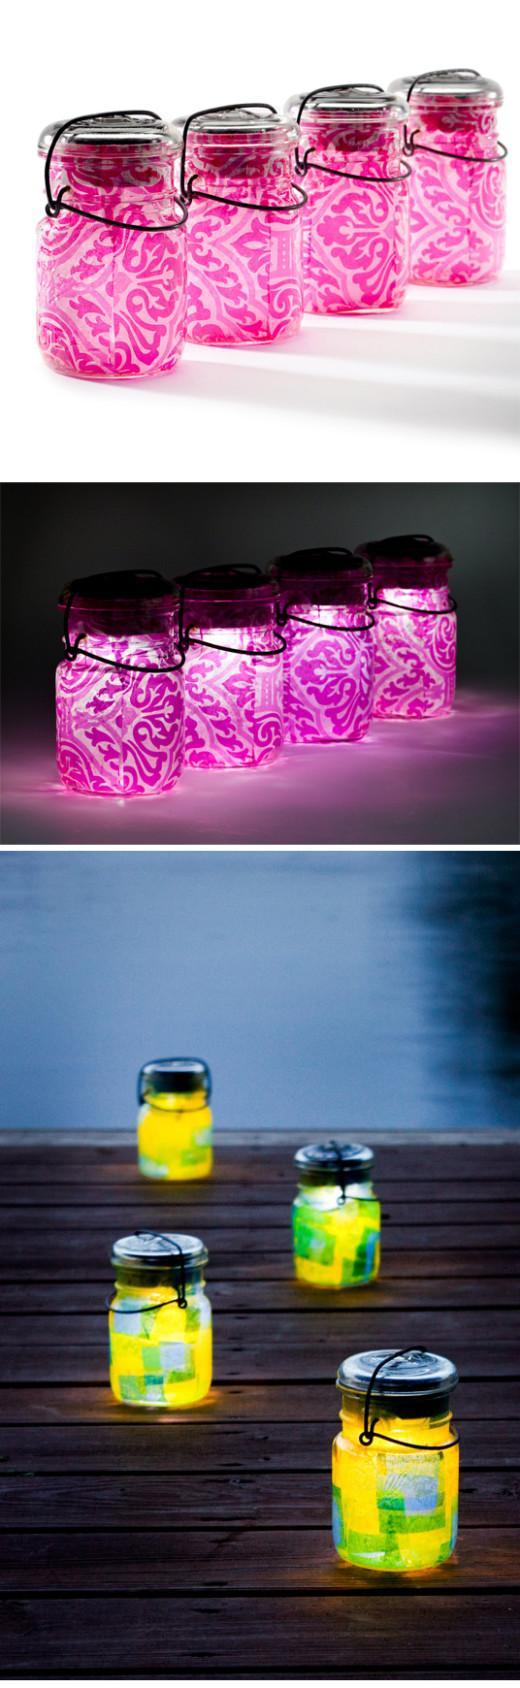 The Mason Jar | Masons of Light